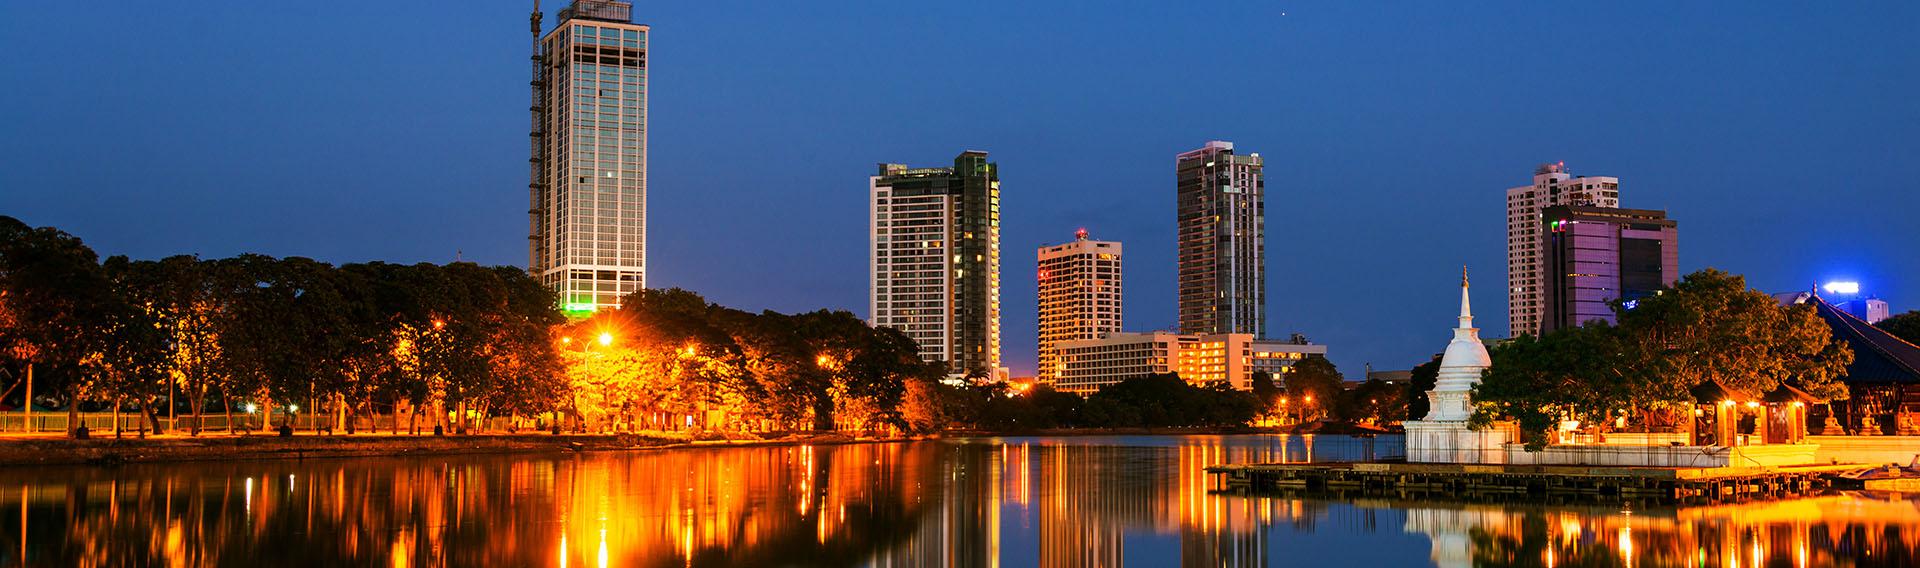 Sri Lanka, côte ouest, Colombo